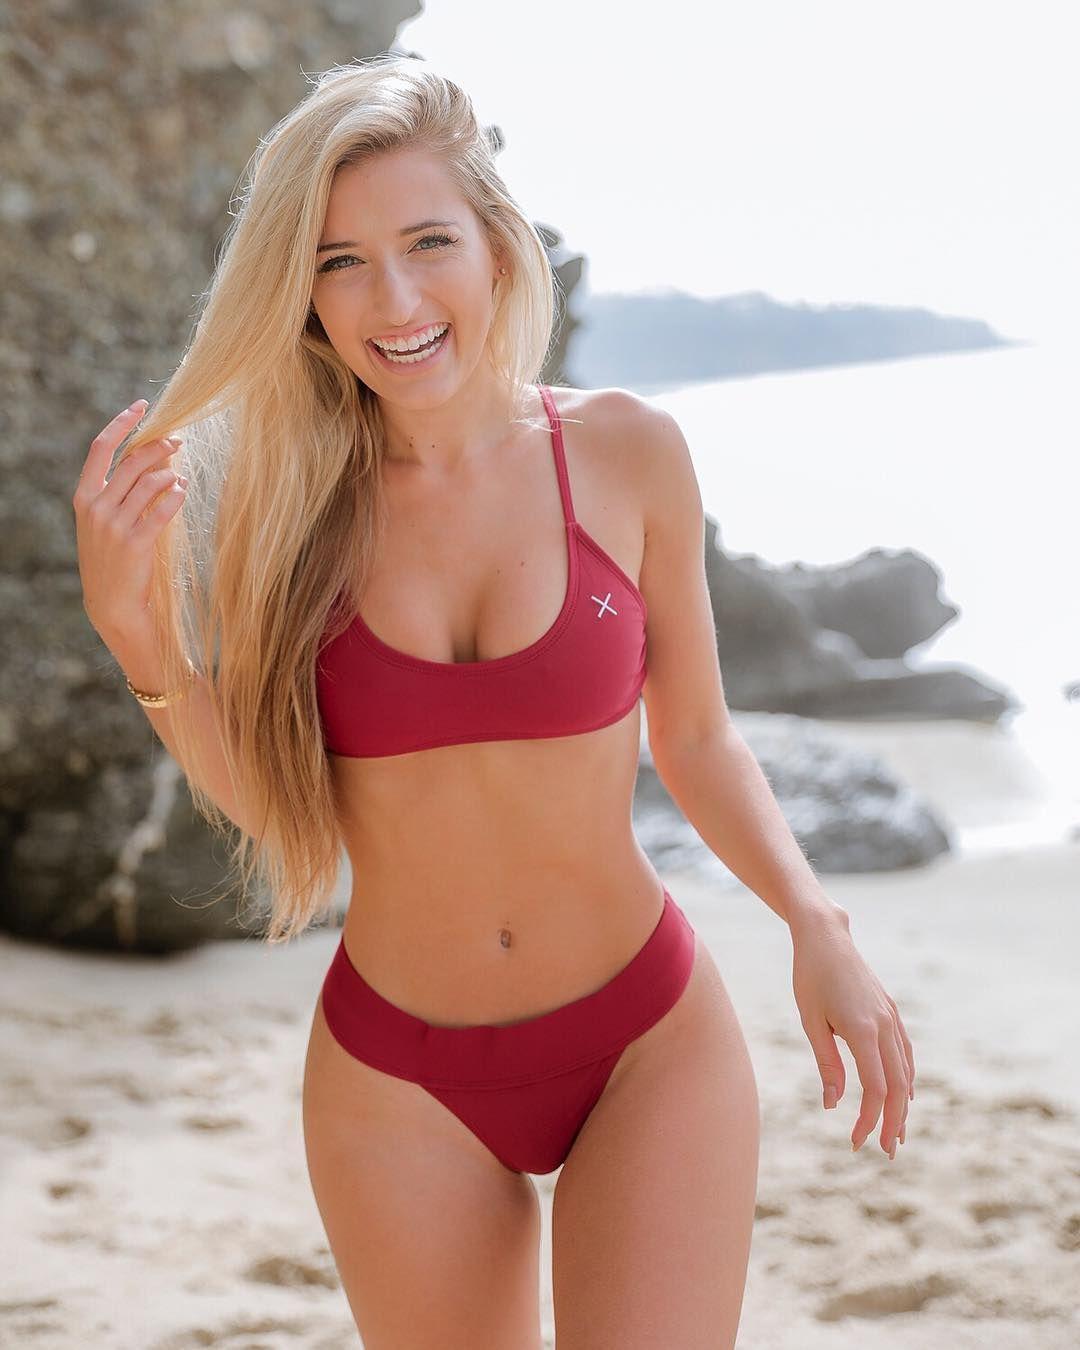 Nonnude bikini model